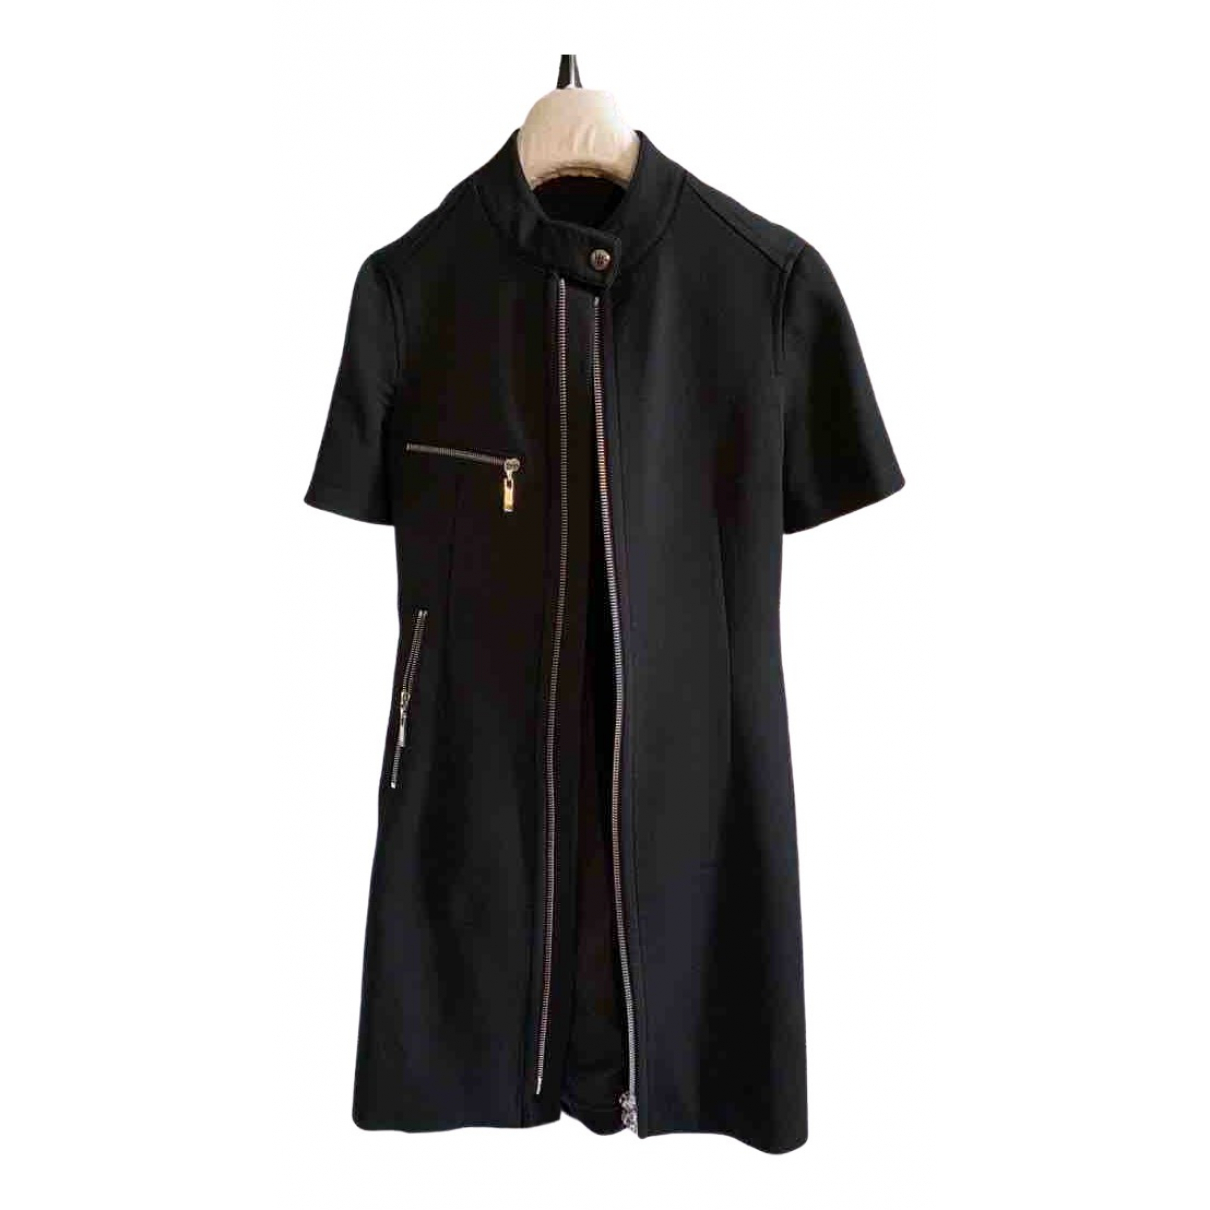 Louis Vuitton \N Black Wool dress for Women 38 FR